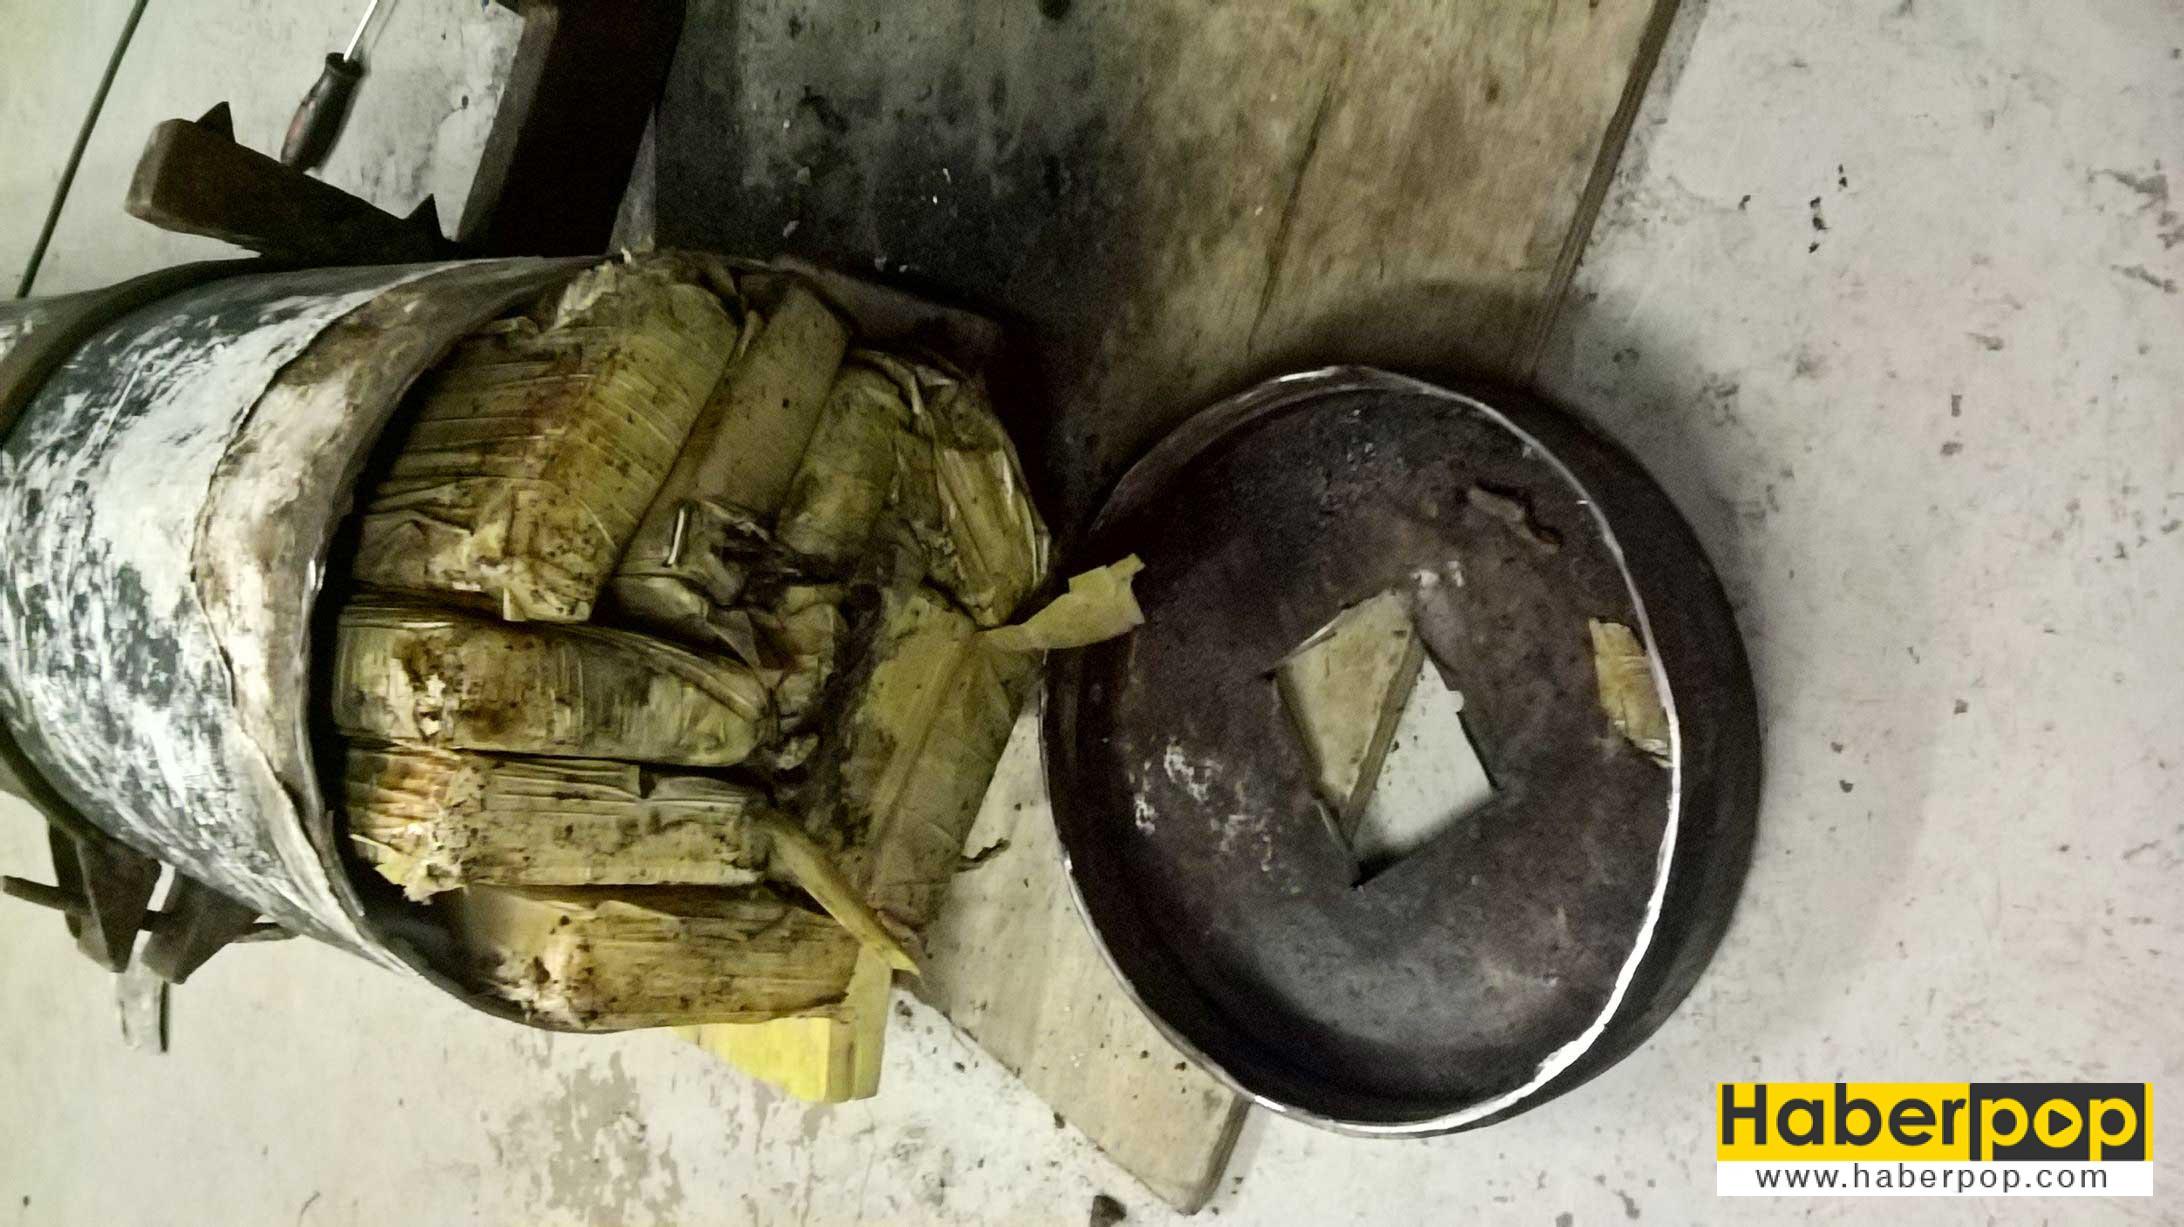 sahile-vuran-torpidonun-icinden-kokain-cikti-video